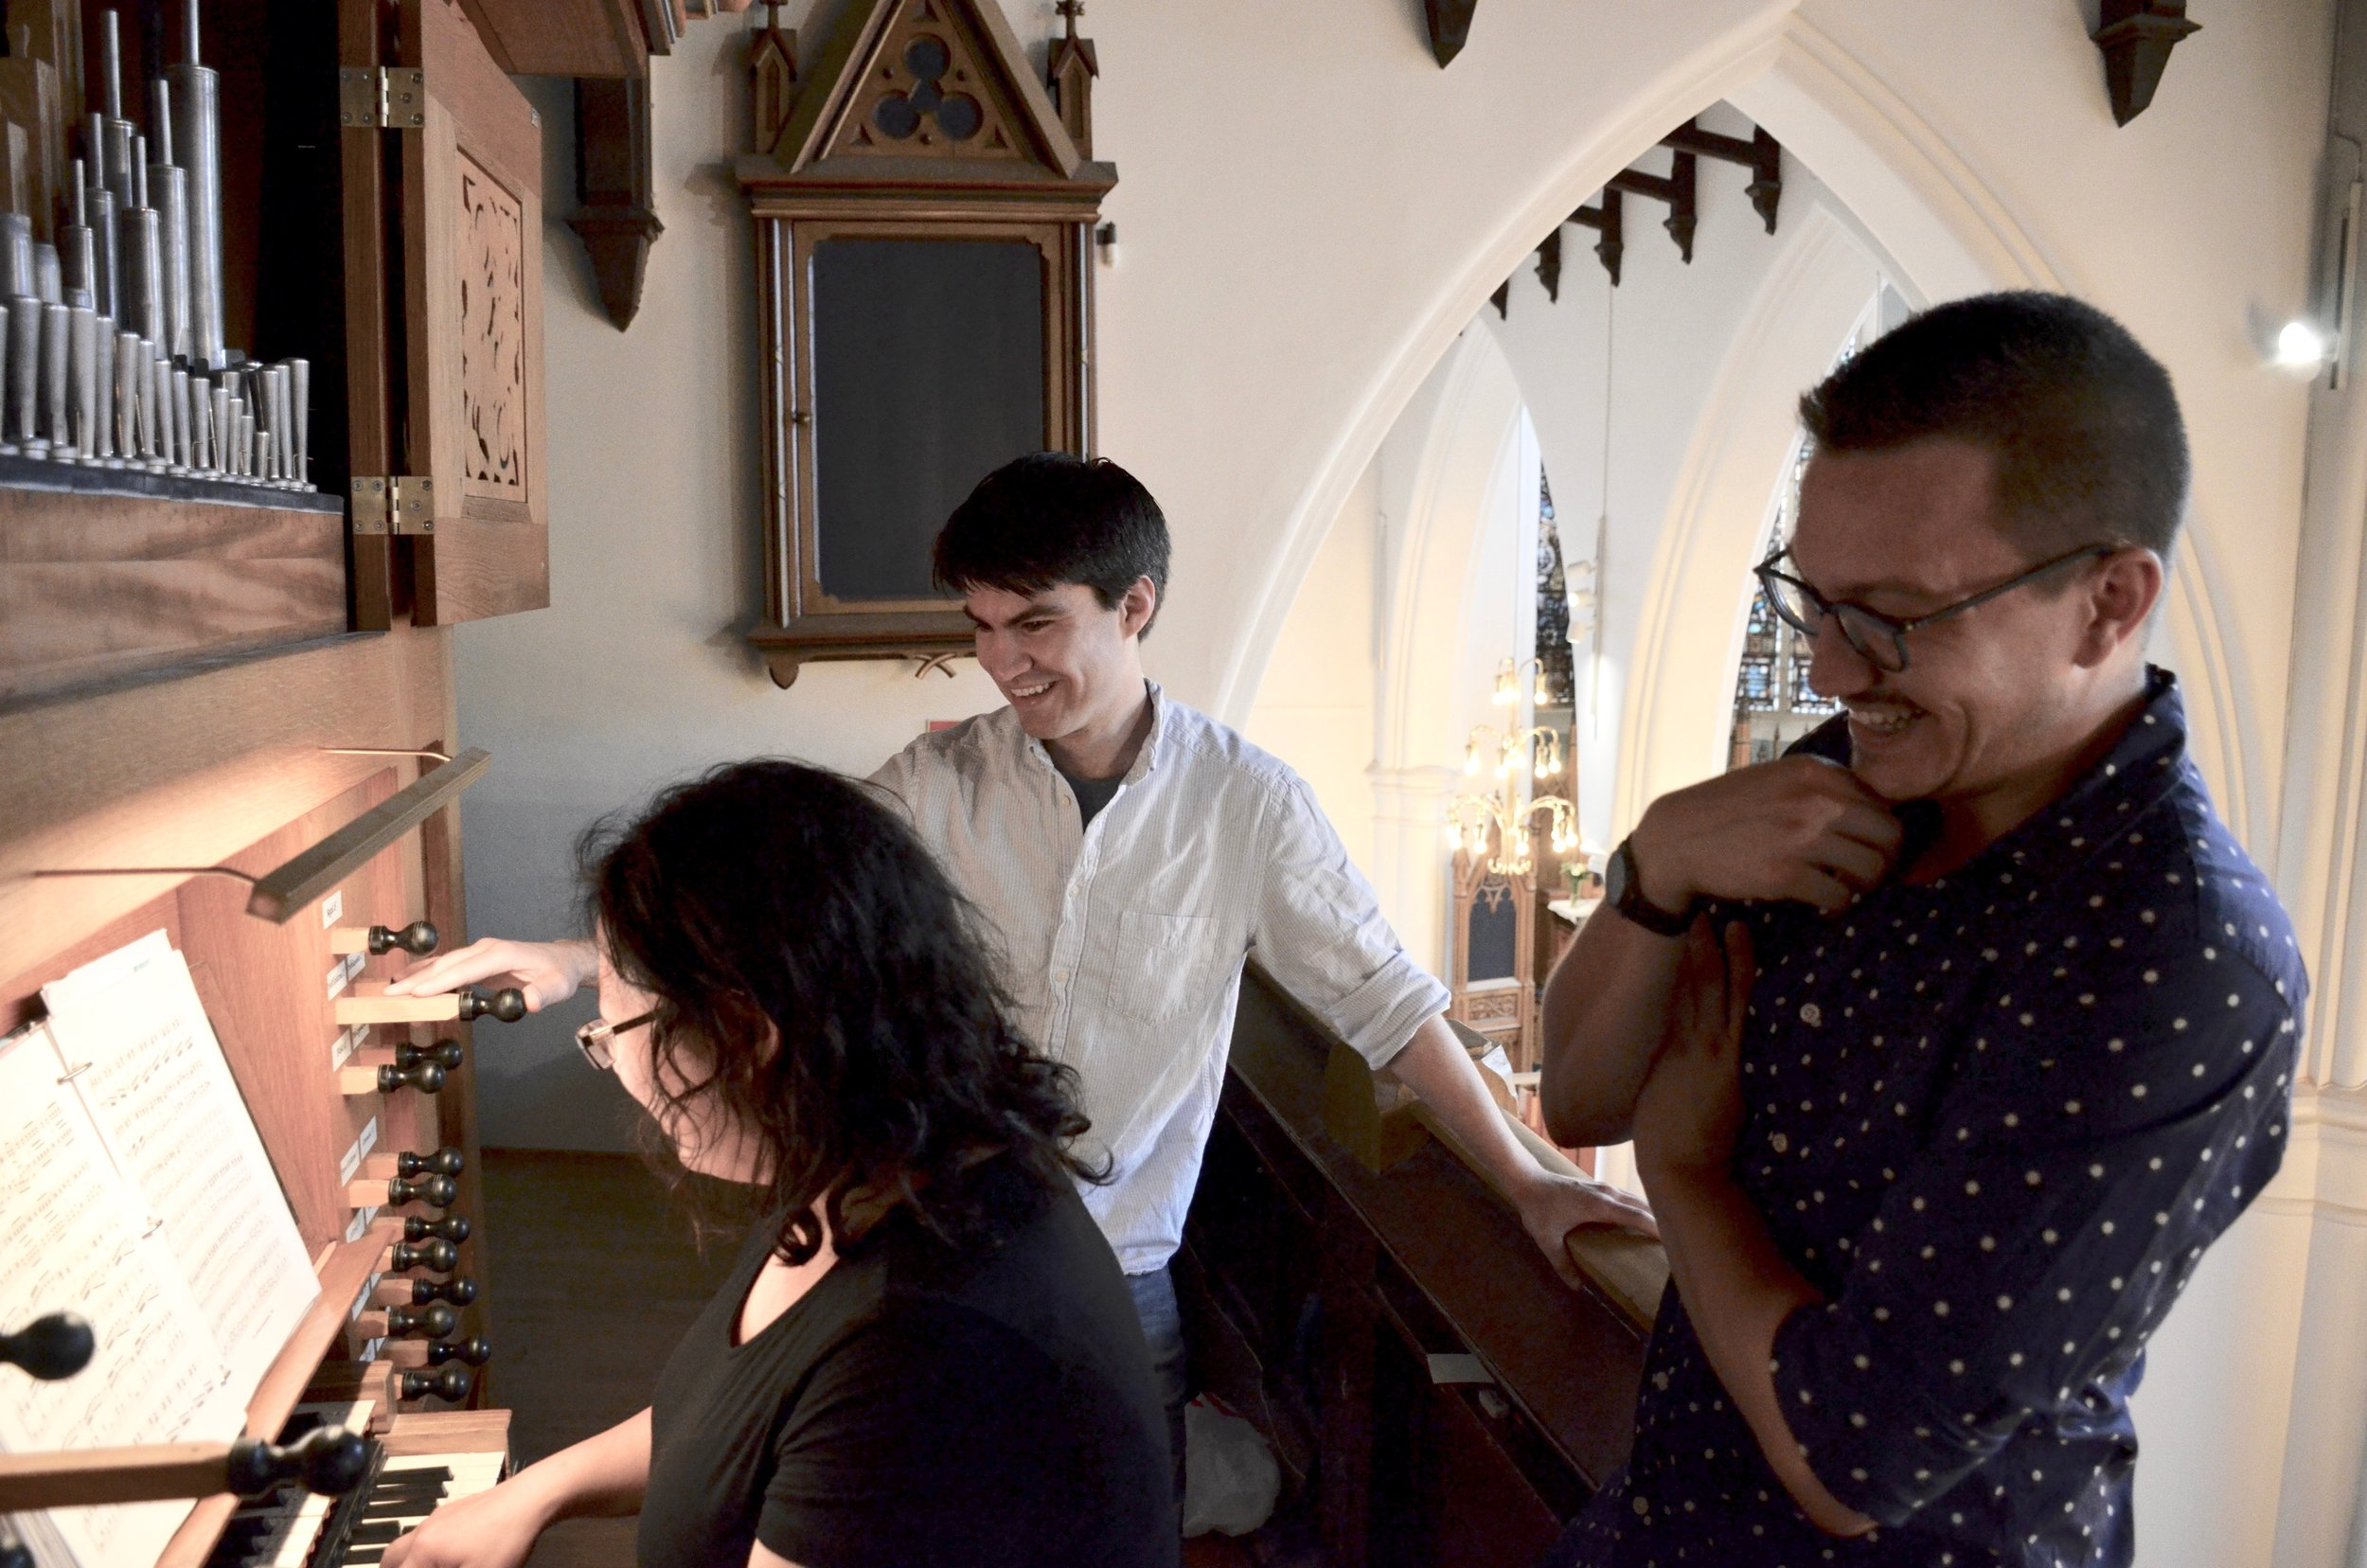 Jennifer Hsiao plays the 1992 Brombaugh organ, Haga Church, Göteborg, Sweden.